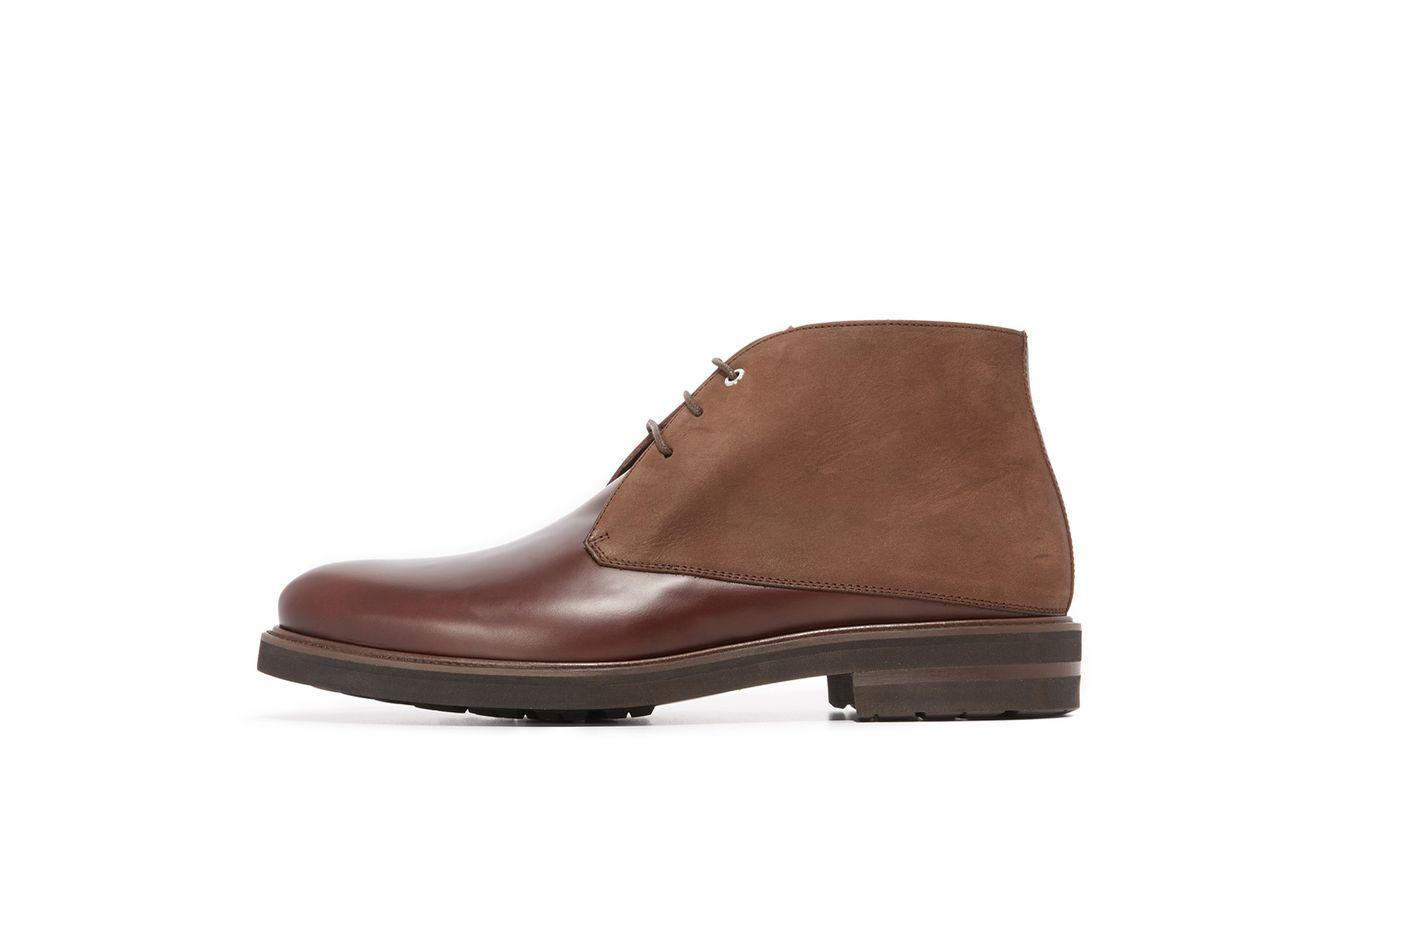 Want Les Essentiels Stewart desert boots